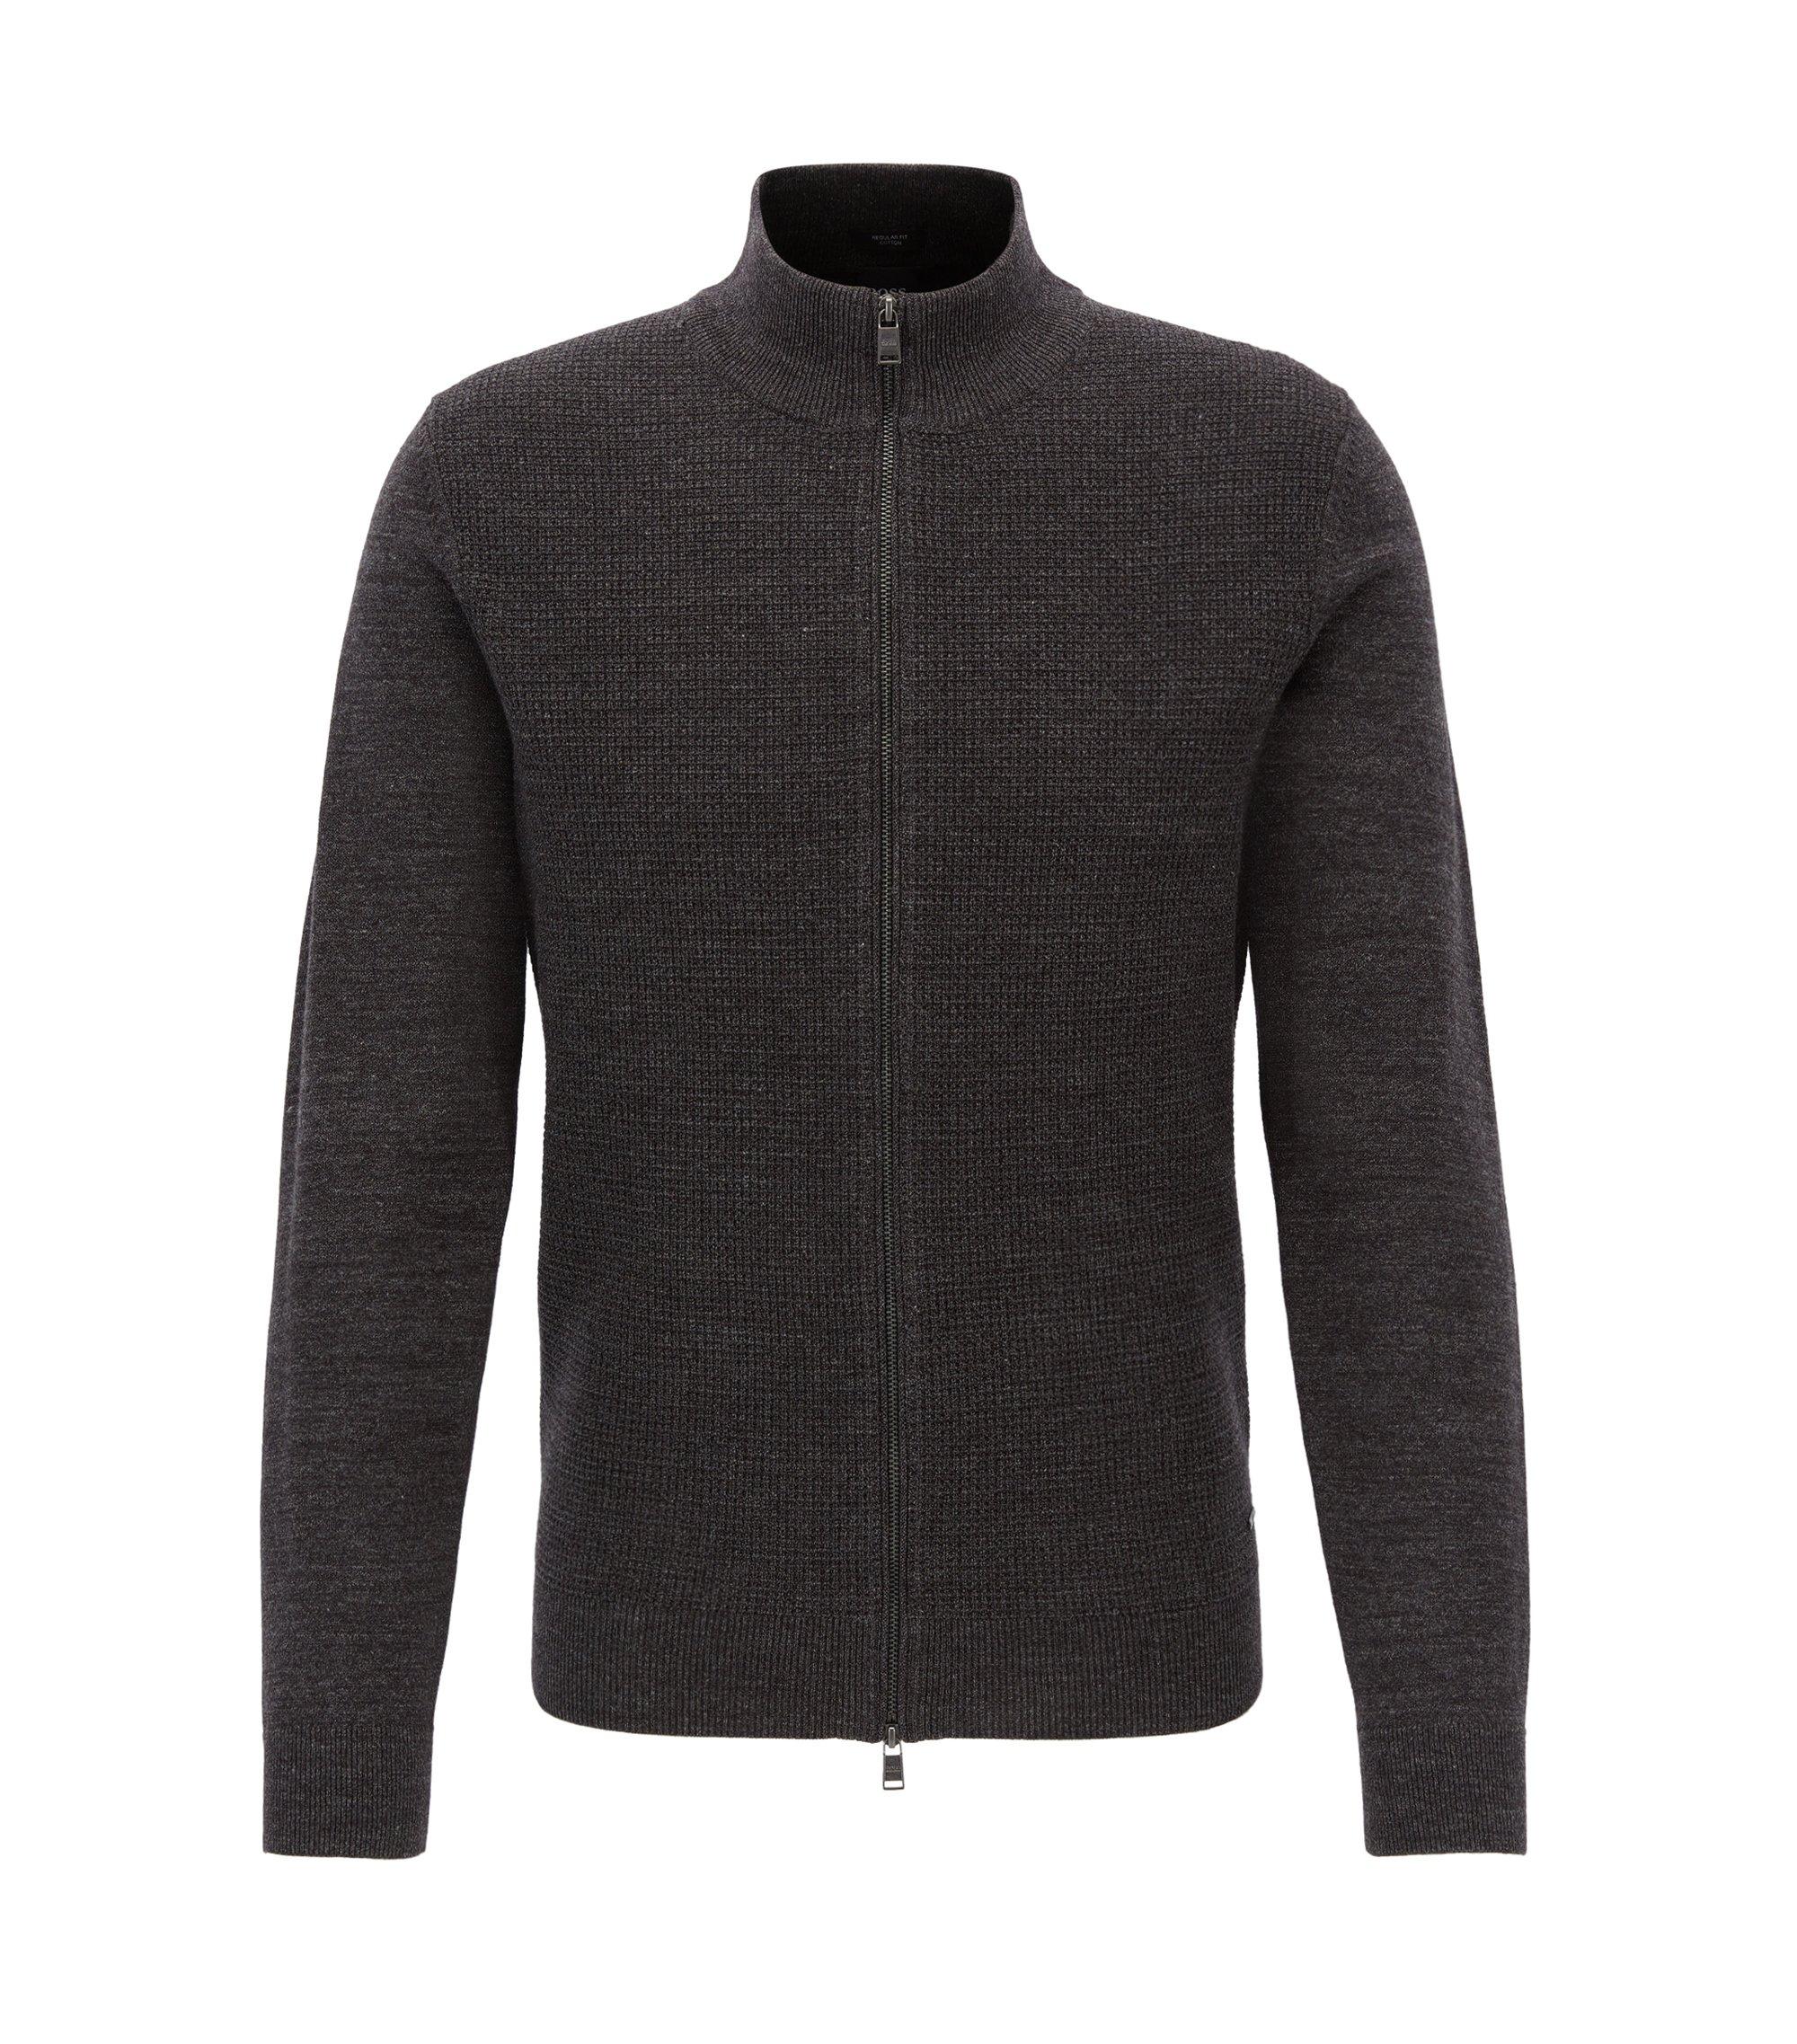 Zip-through cardigan jacket in mélange cotton, Dark Grey